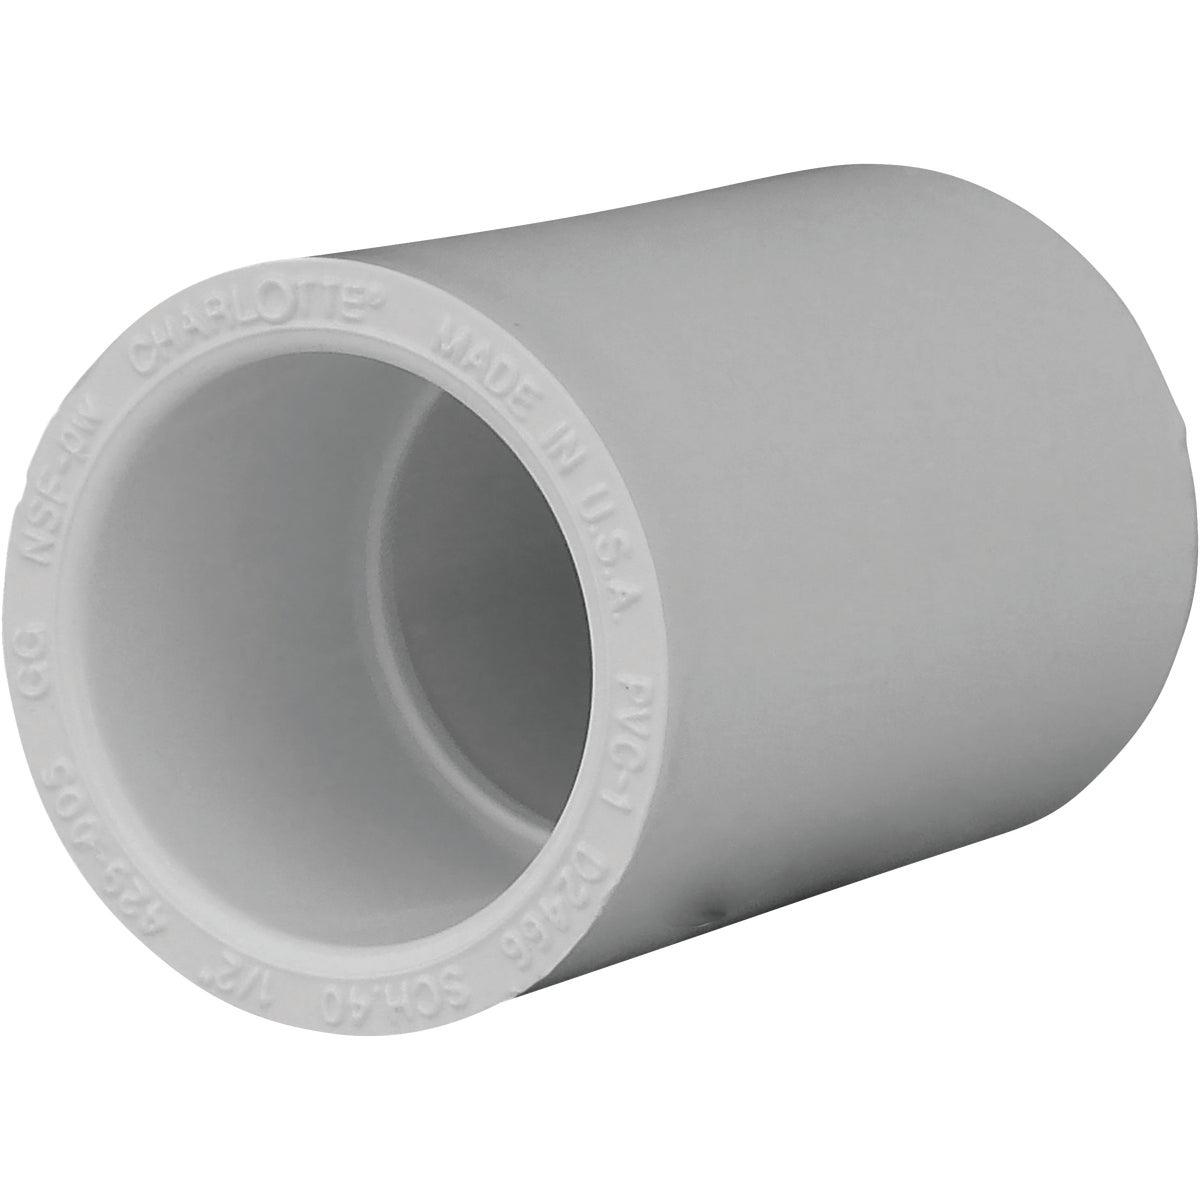 "1/2"" SCH40 PVC COUPLING"